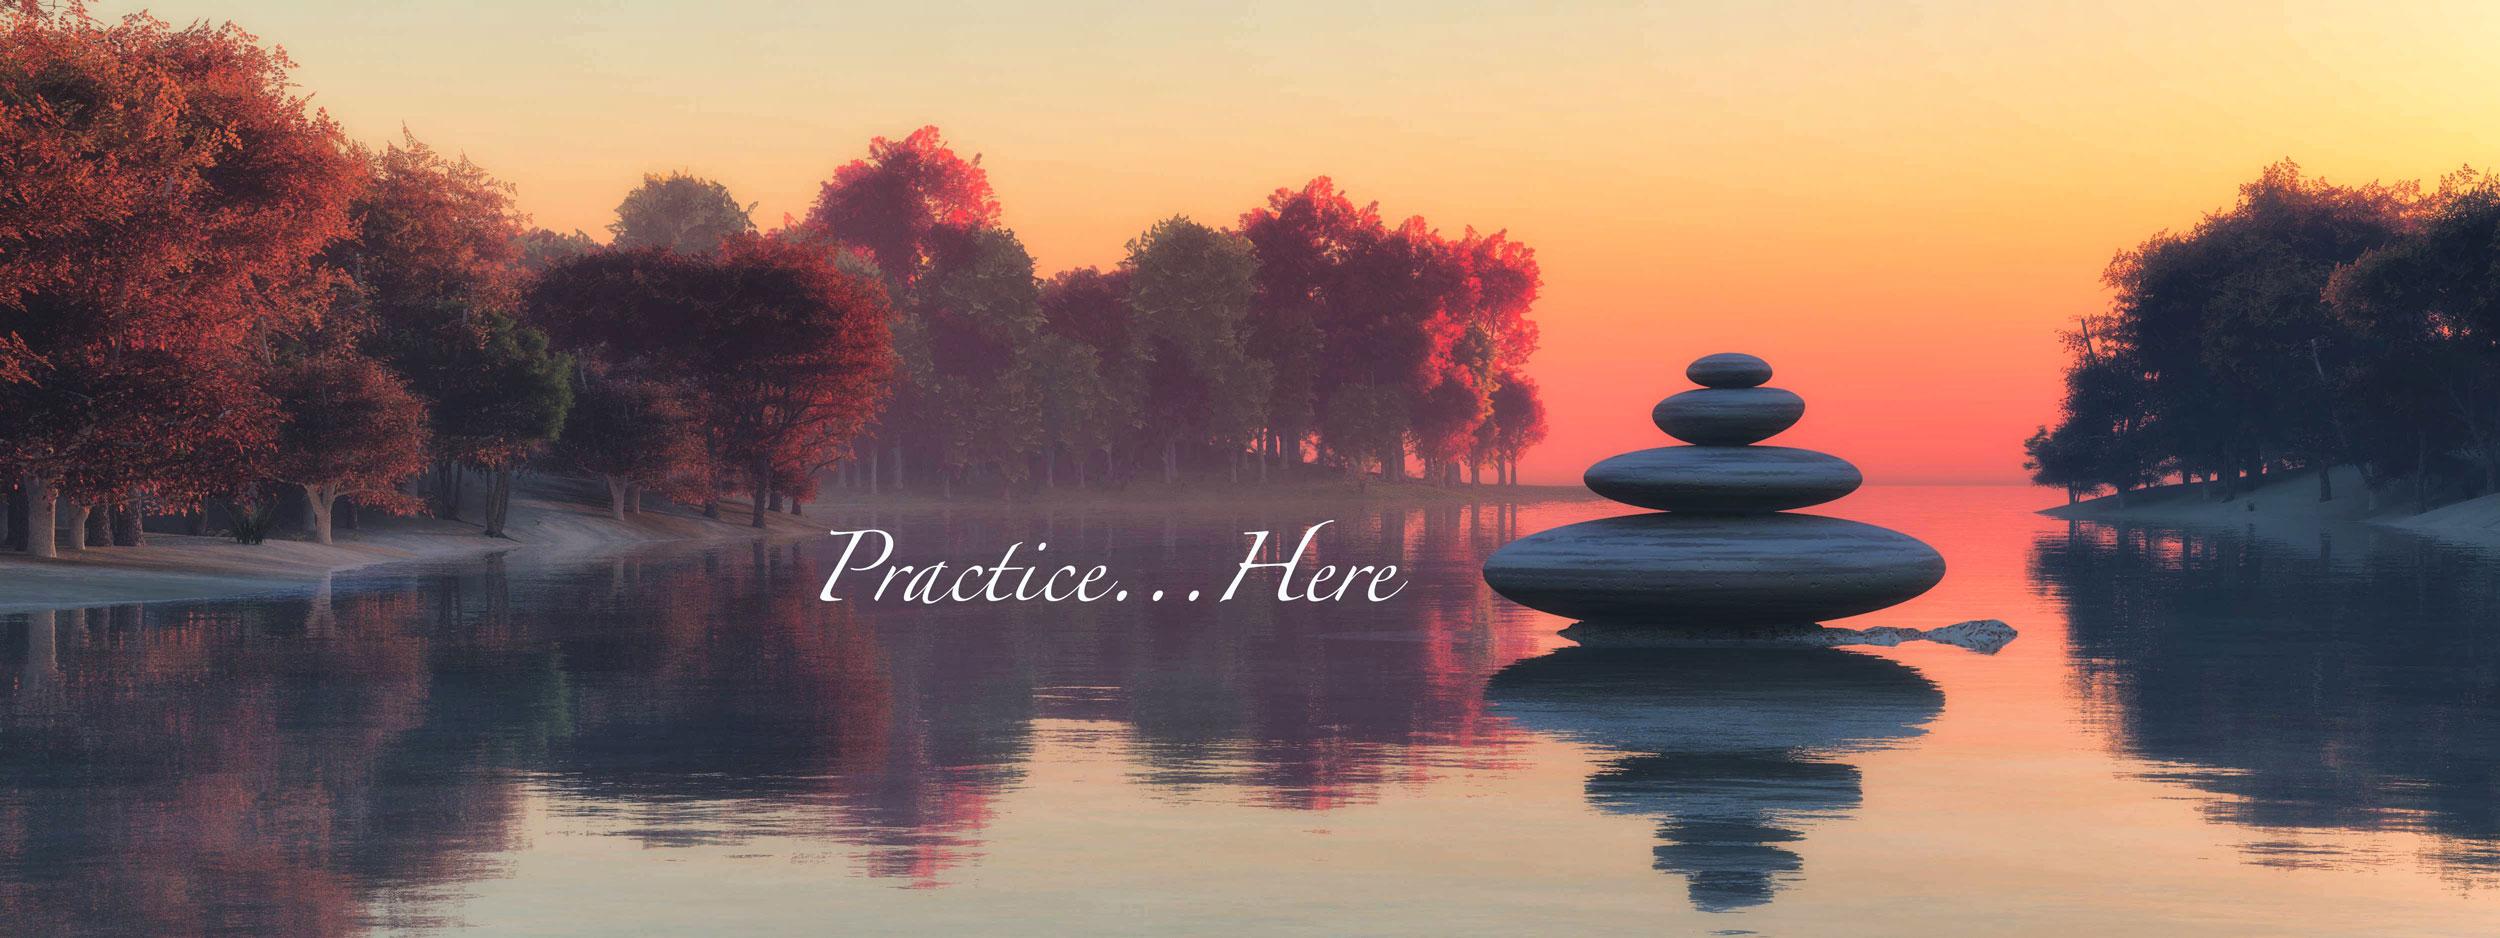 meditation, practice here